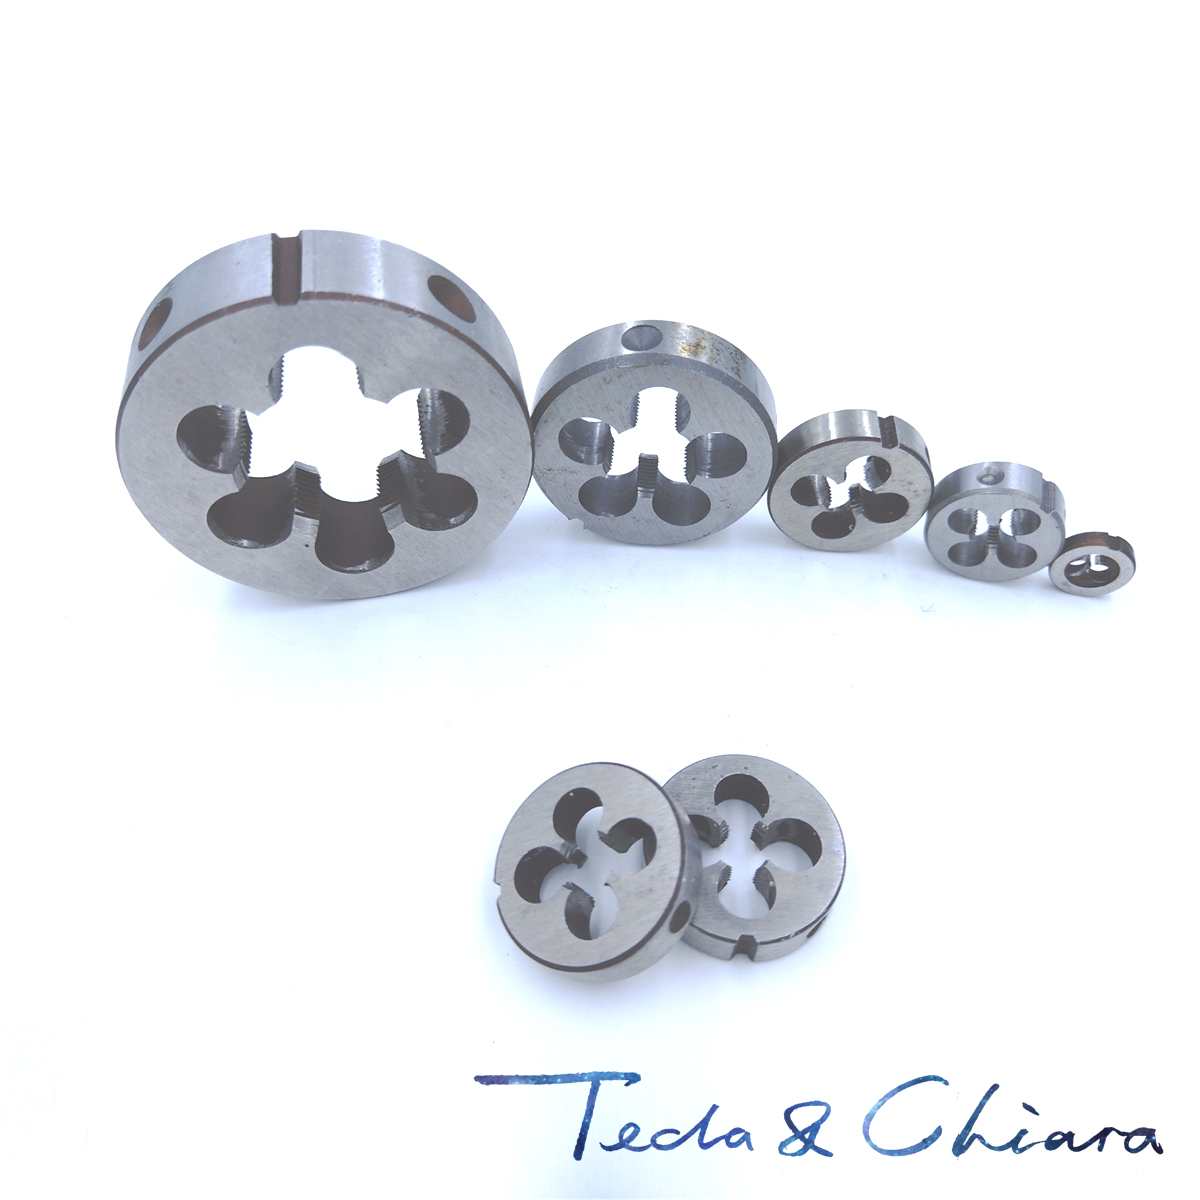 1Pc M12 M13 X 0.75mm 1mm 1.25mm 1.5mm 1.75mm 2mm Metric Right Hand Die Threading Tools Mold Machining * 0.75 1 1.25 1.5 1.75 2